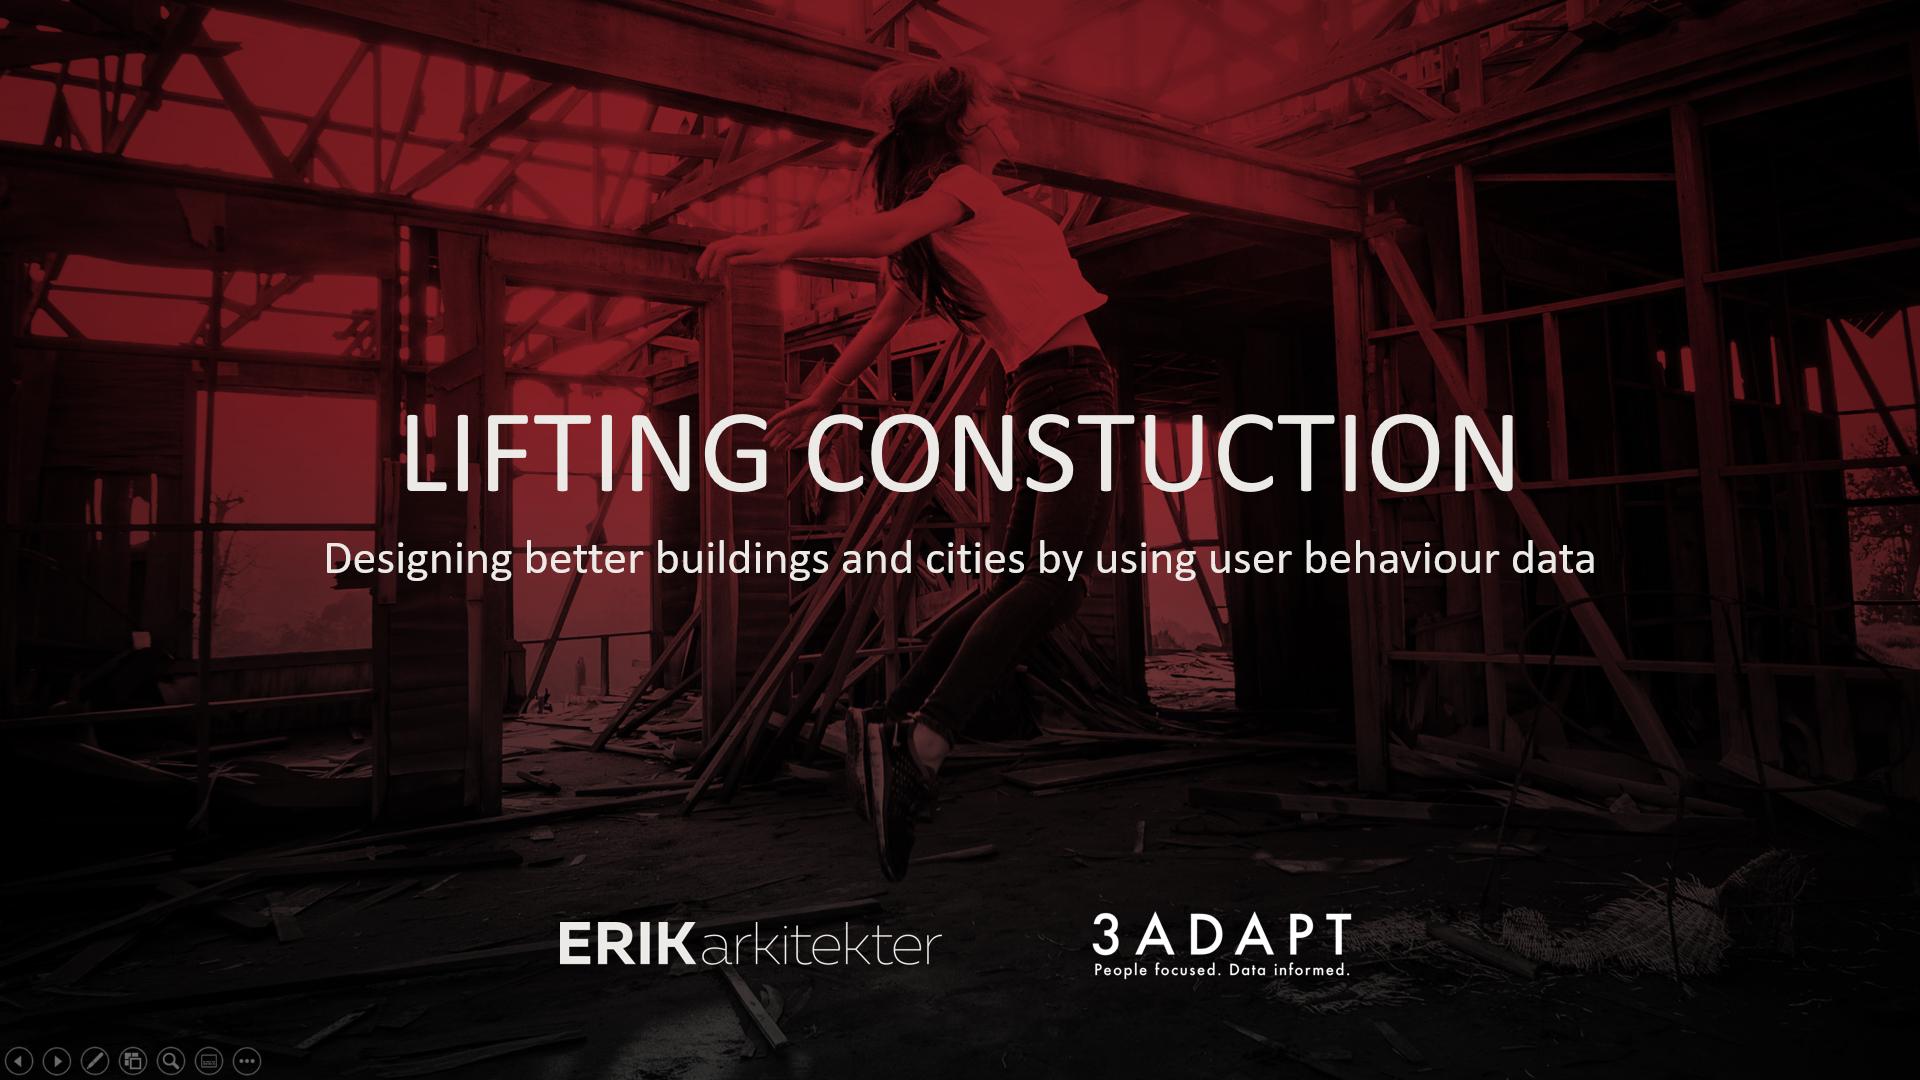 Lifting Construction Image.png